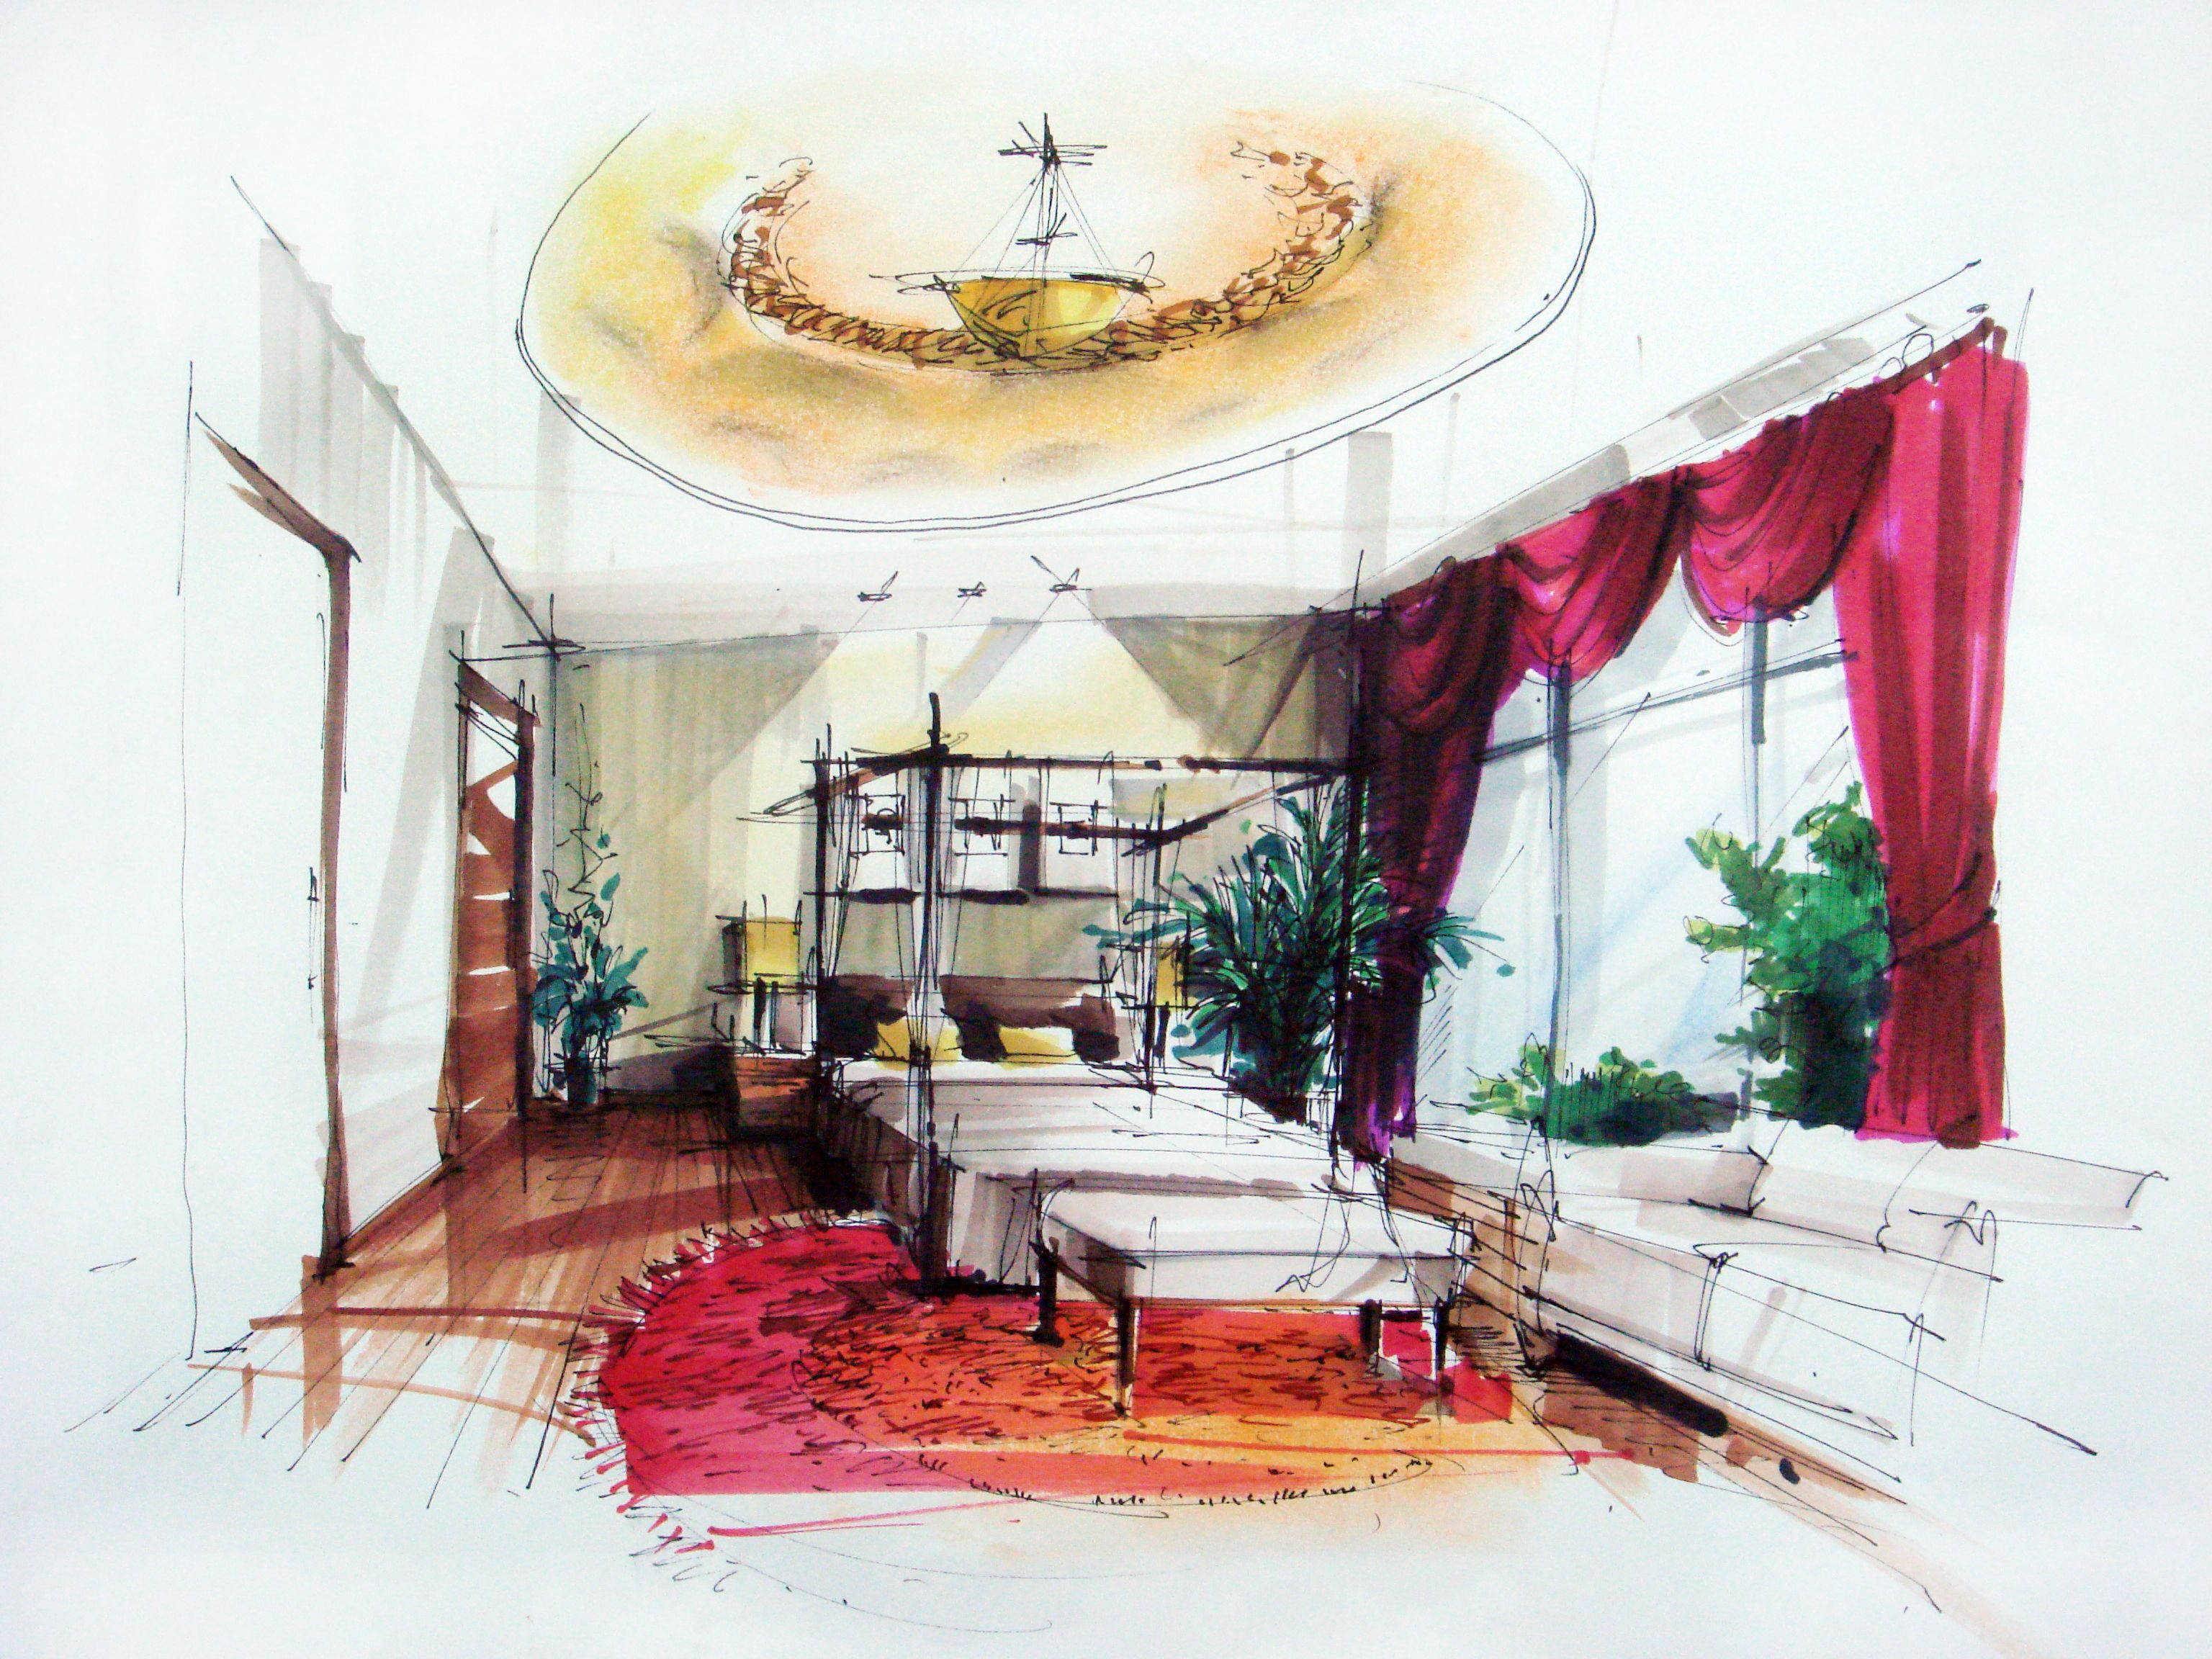 interior design drawings  Google Search  Interior design  Interior design sketches Interior